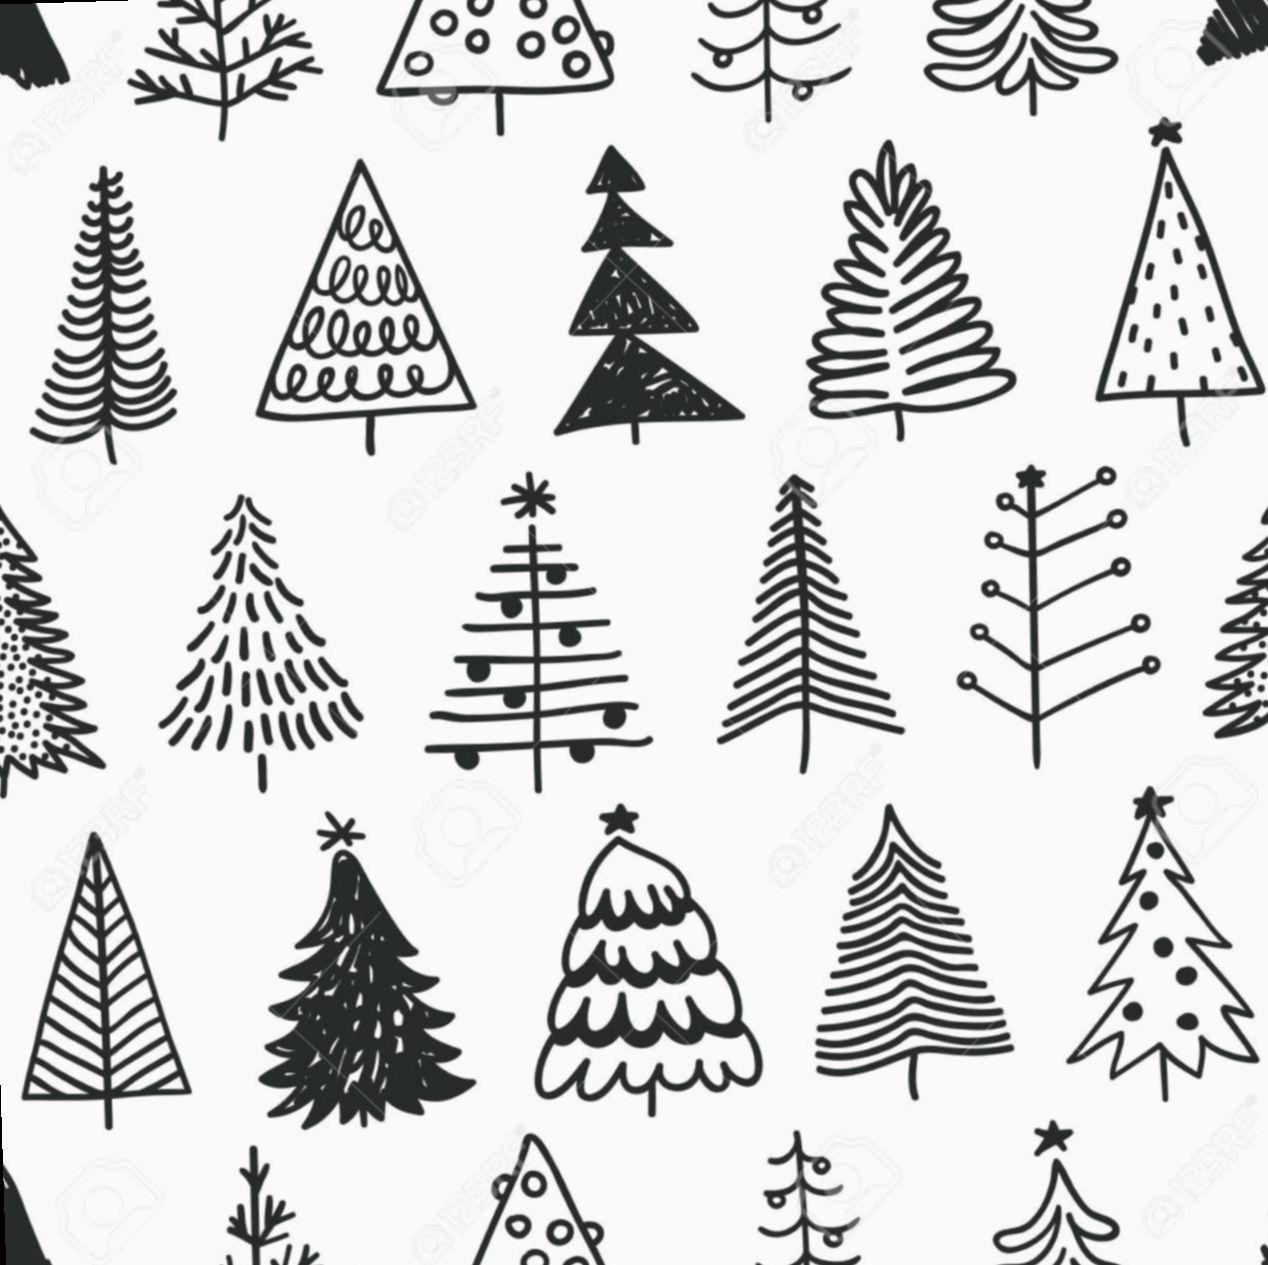 Drawing Doodles Simple Hand Drawn Eyesdraw Eyedrawing Eyesketch Christmas Tree Drawing Tree Doodle Christmas Doodles